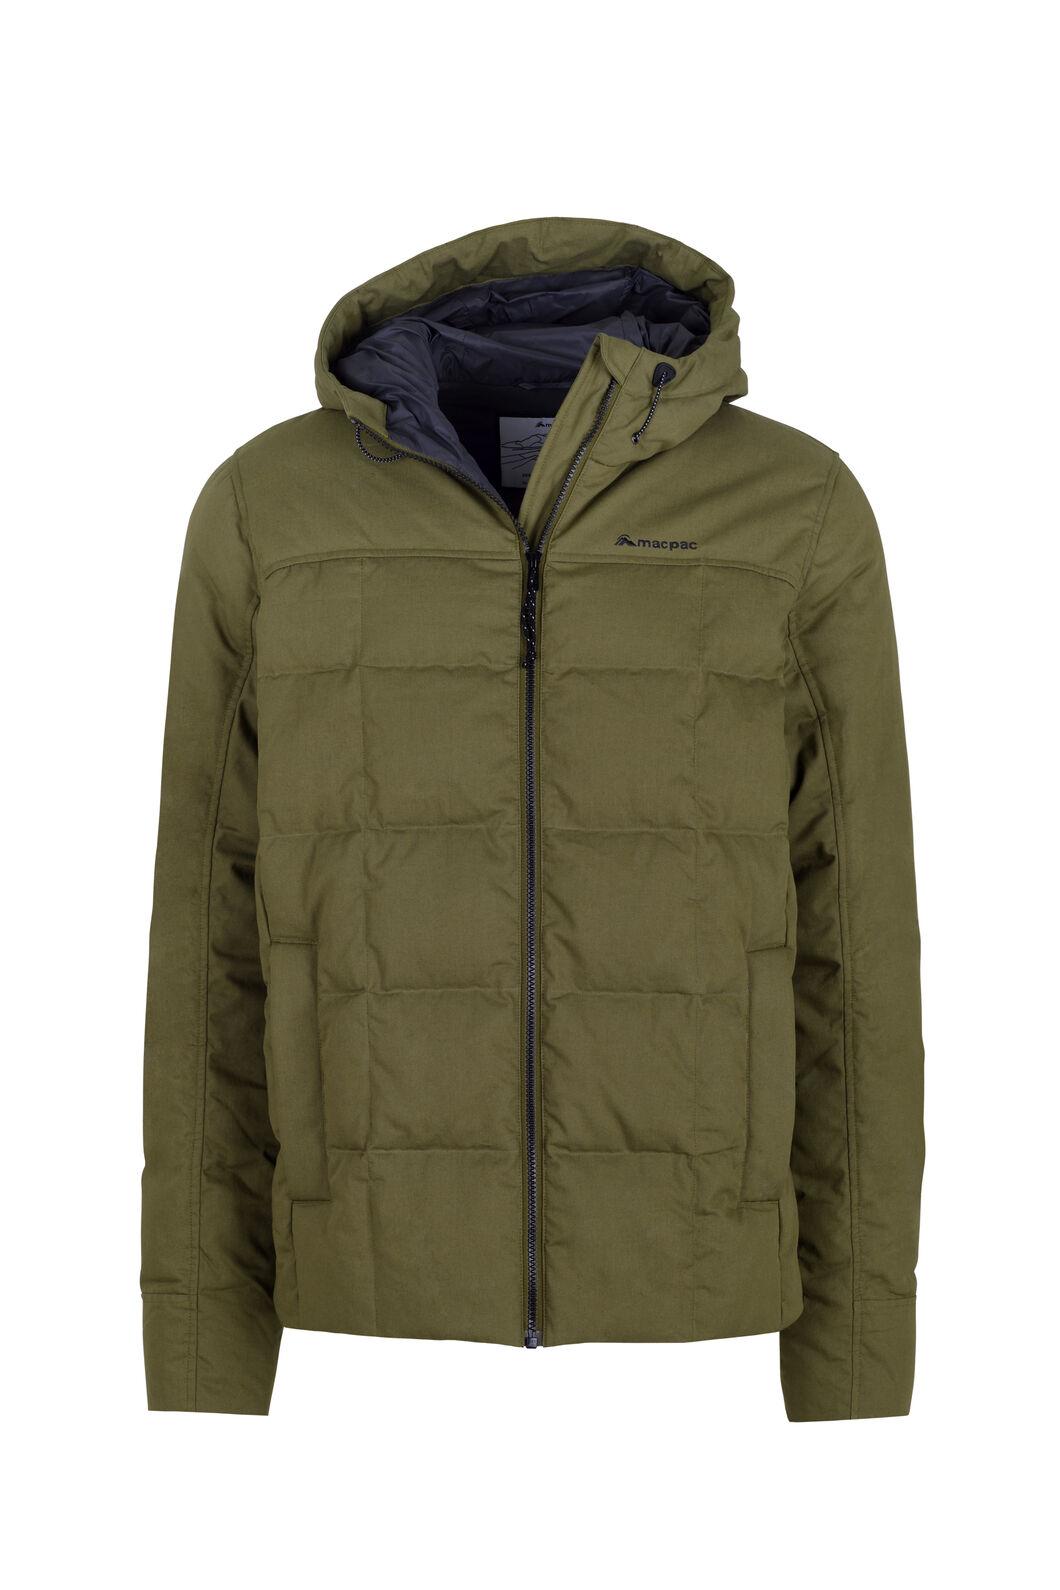 Macpac Fusion Jacket -Men's, Military Olive, hi-res